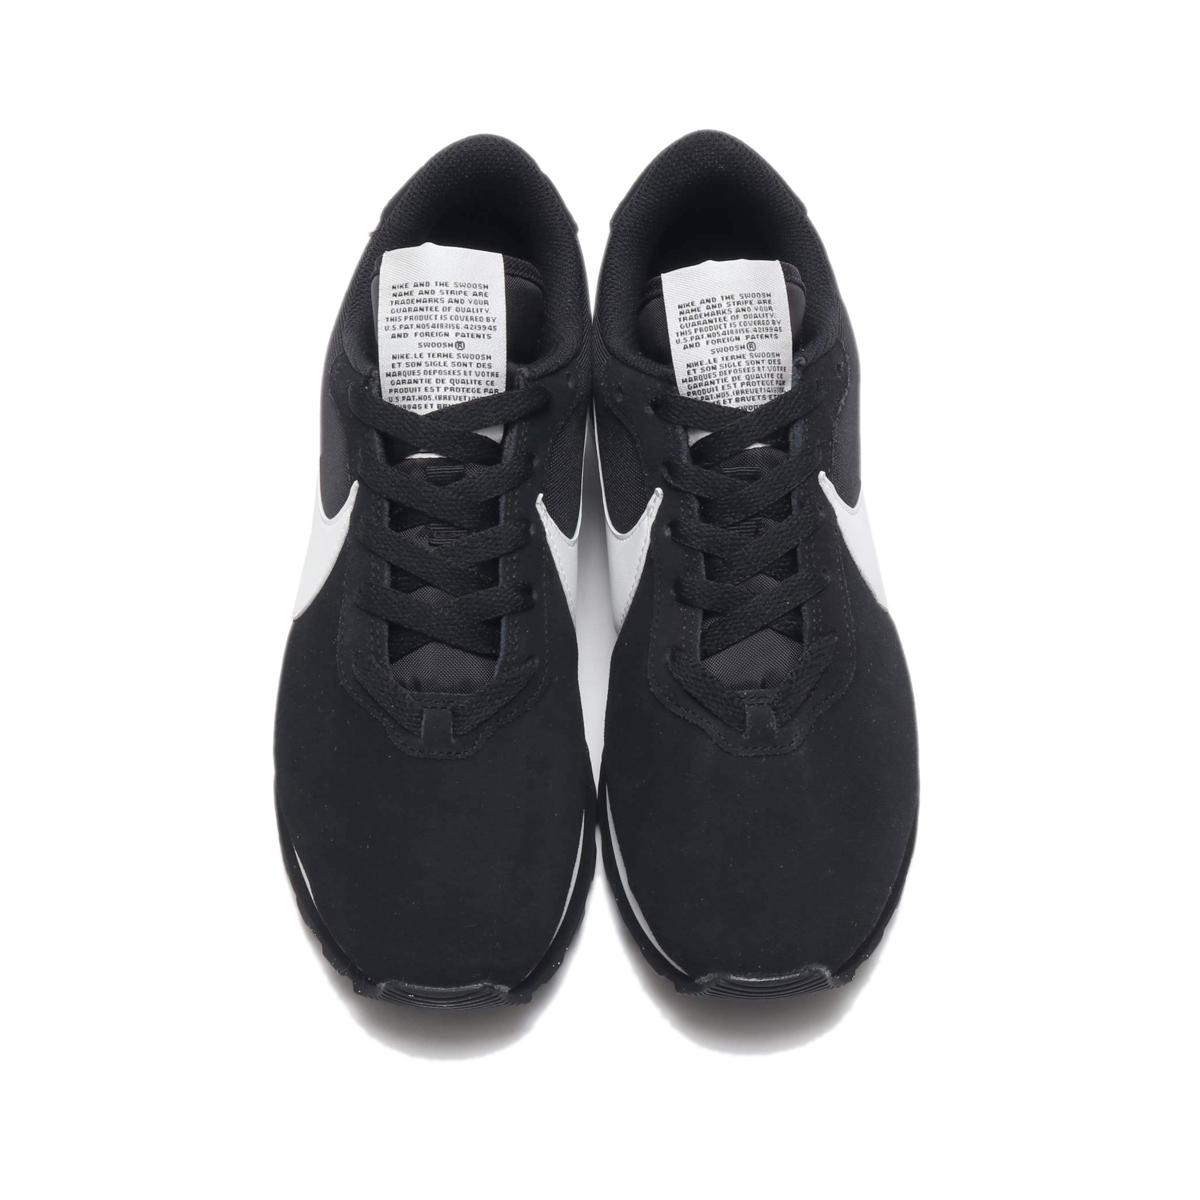 NIKE W PRE-LOVE O.X. (Nike women pre-love OX) BLACK SUMMIT WHITE 18FA-S d7359a7dab